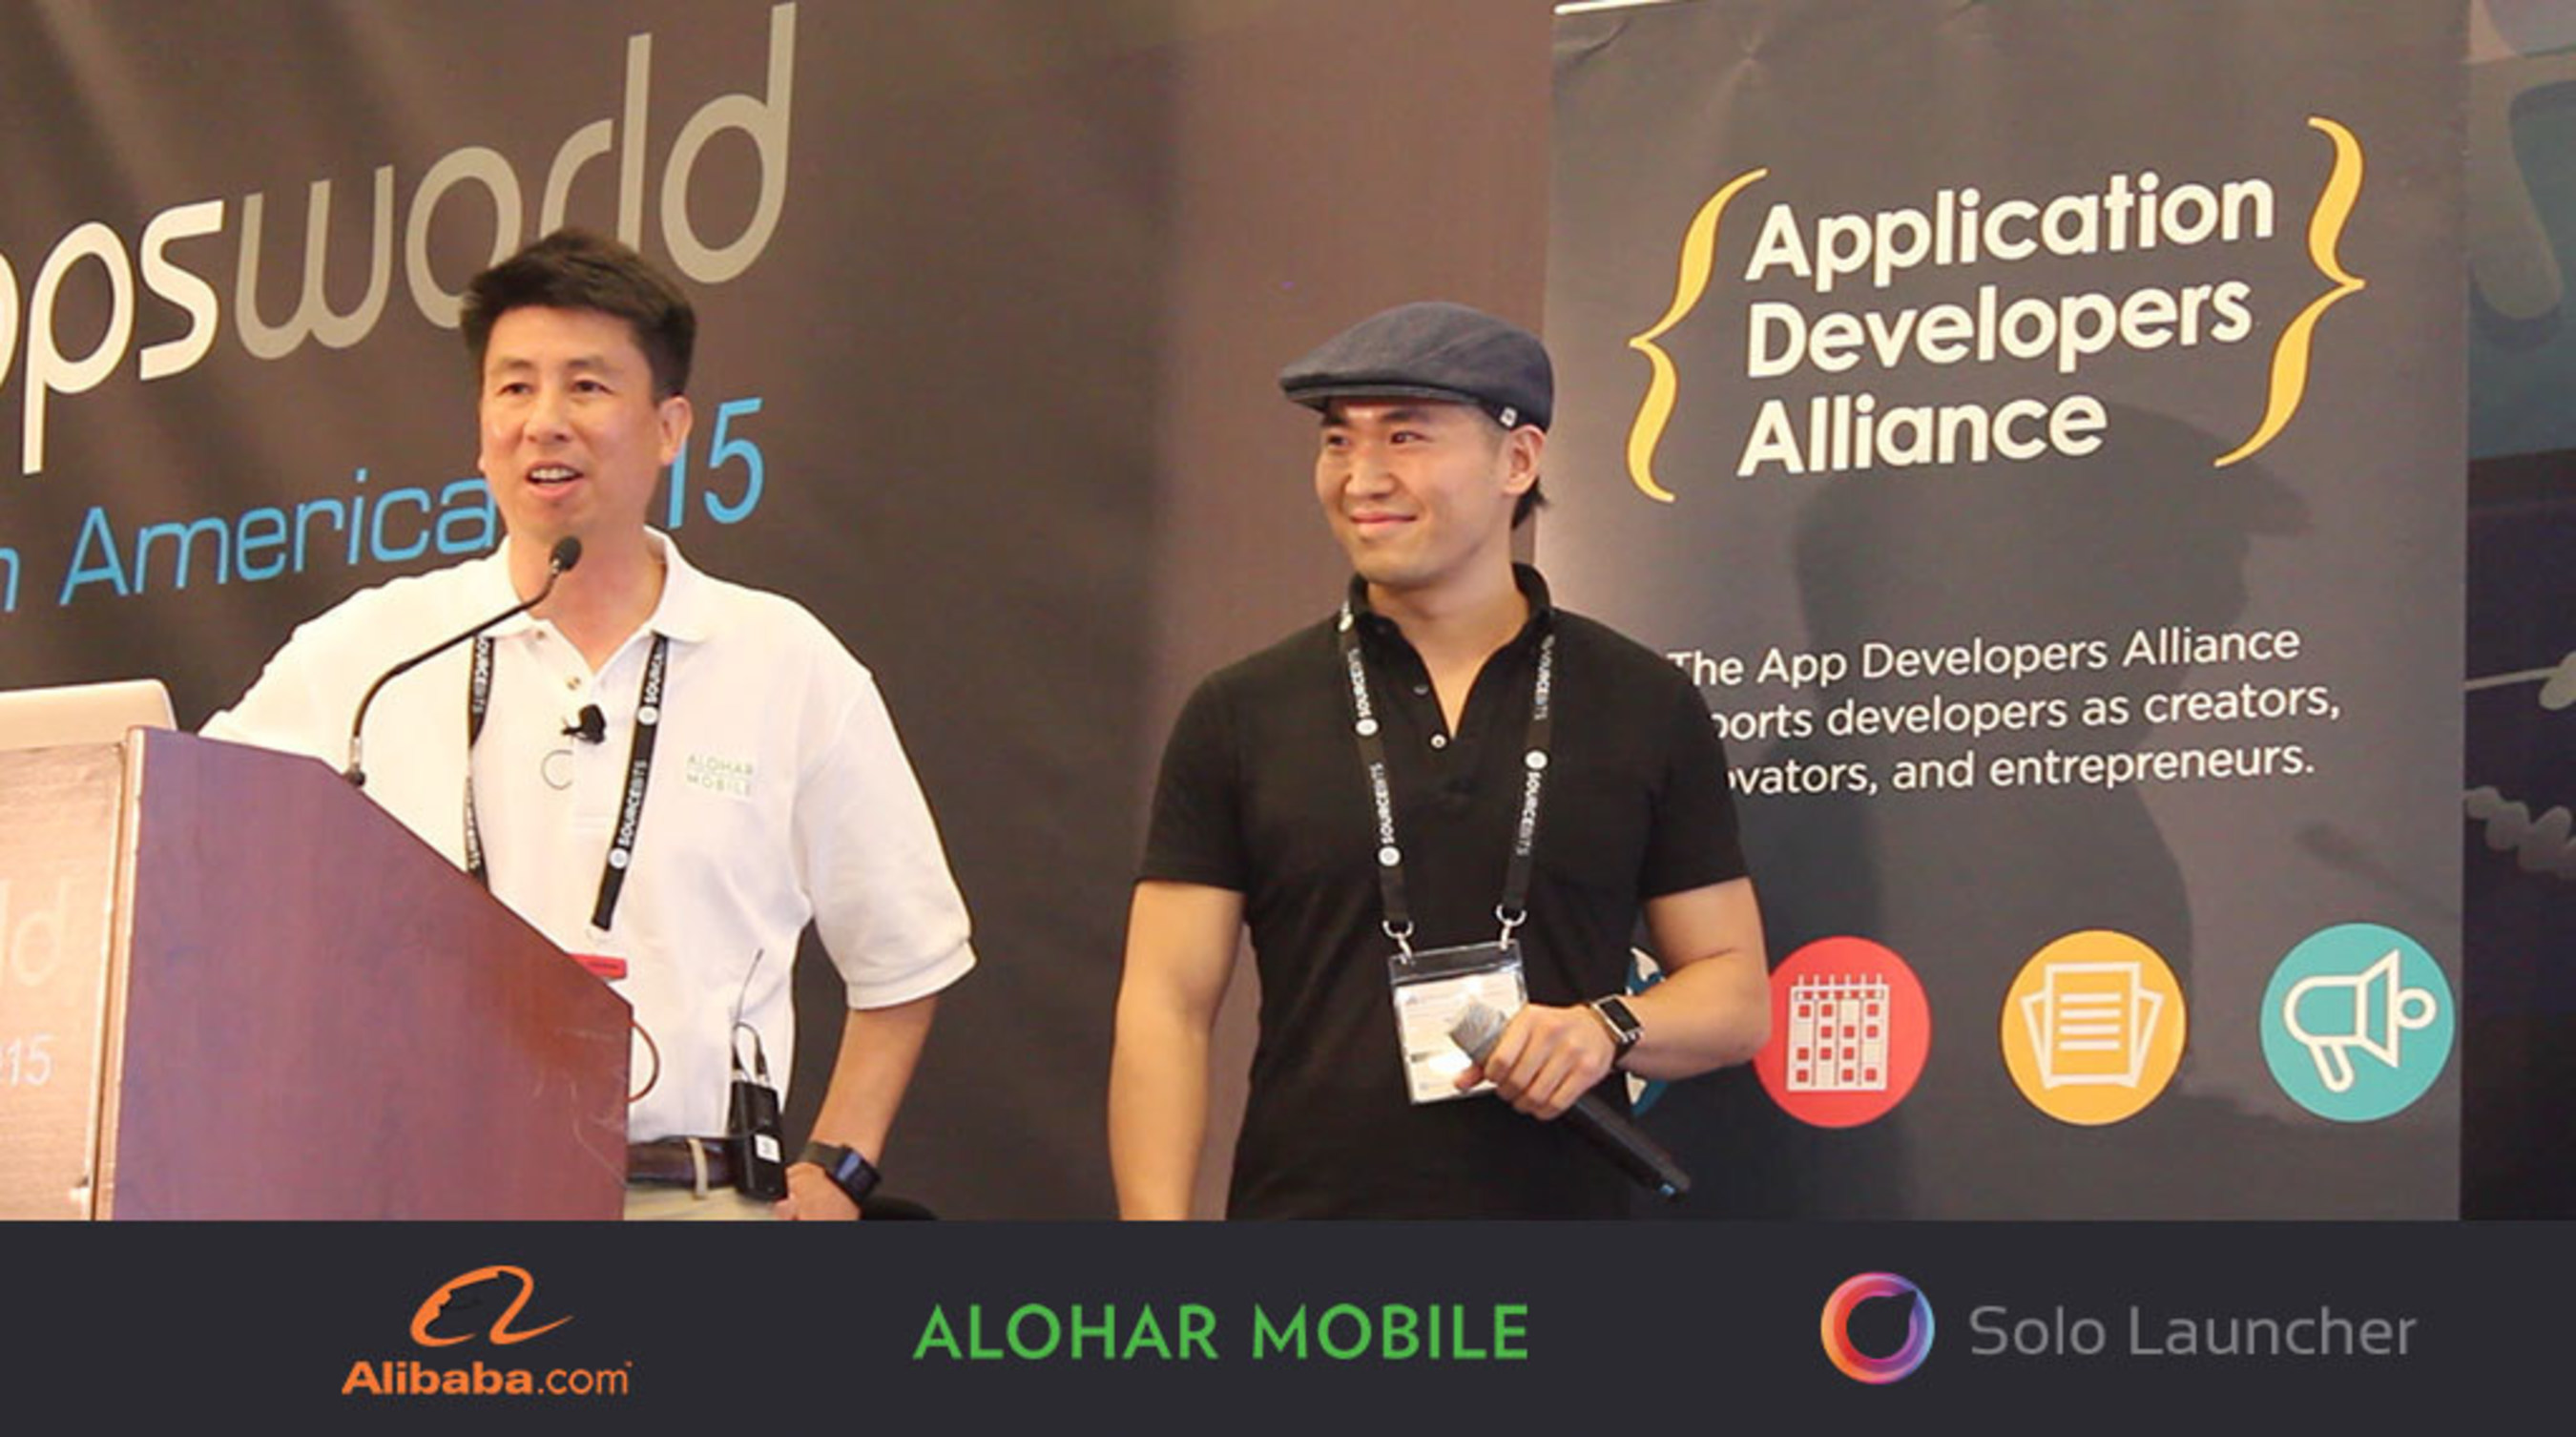 Sam and Peter Speaking at AppsWorld 2015